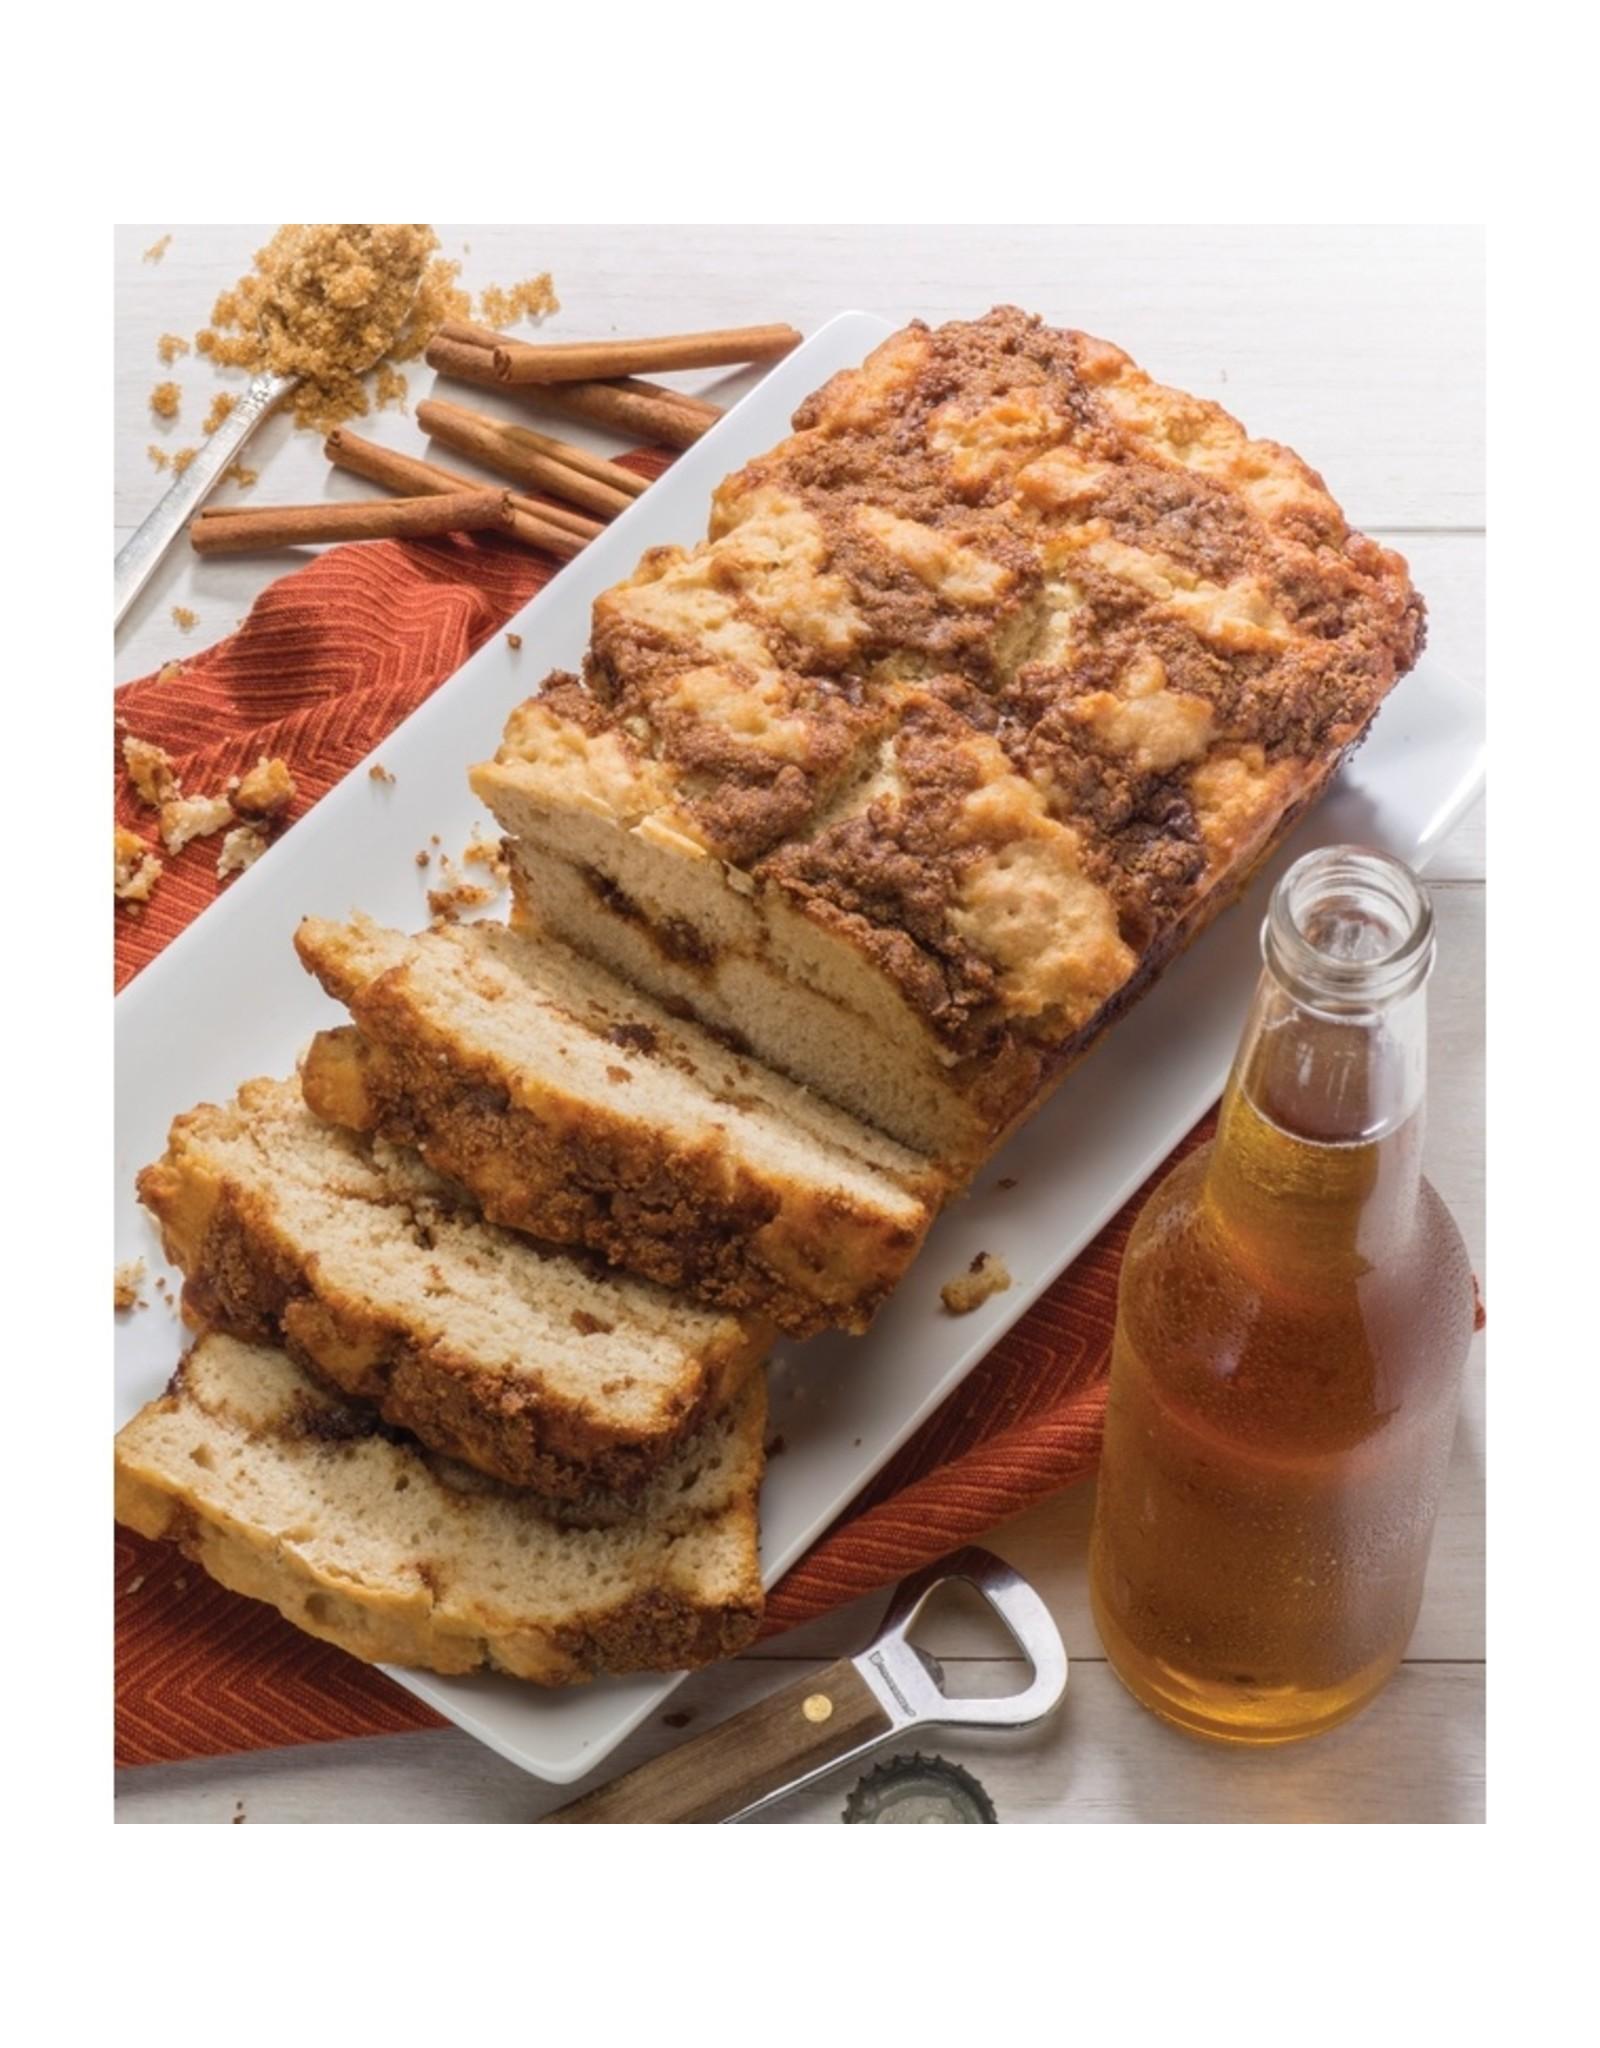 Beer Bread, Gluten Free Cinnamon Crumble